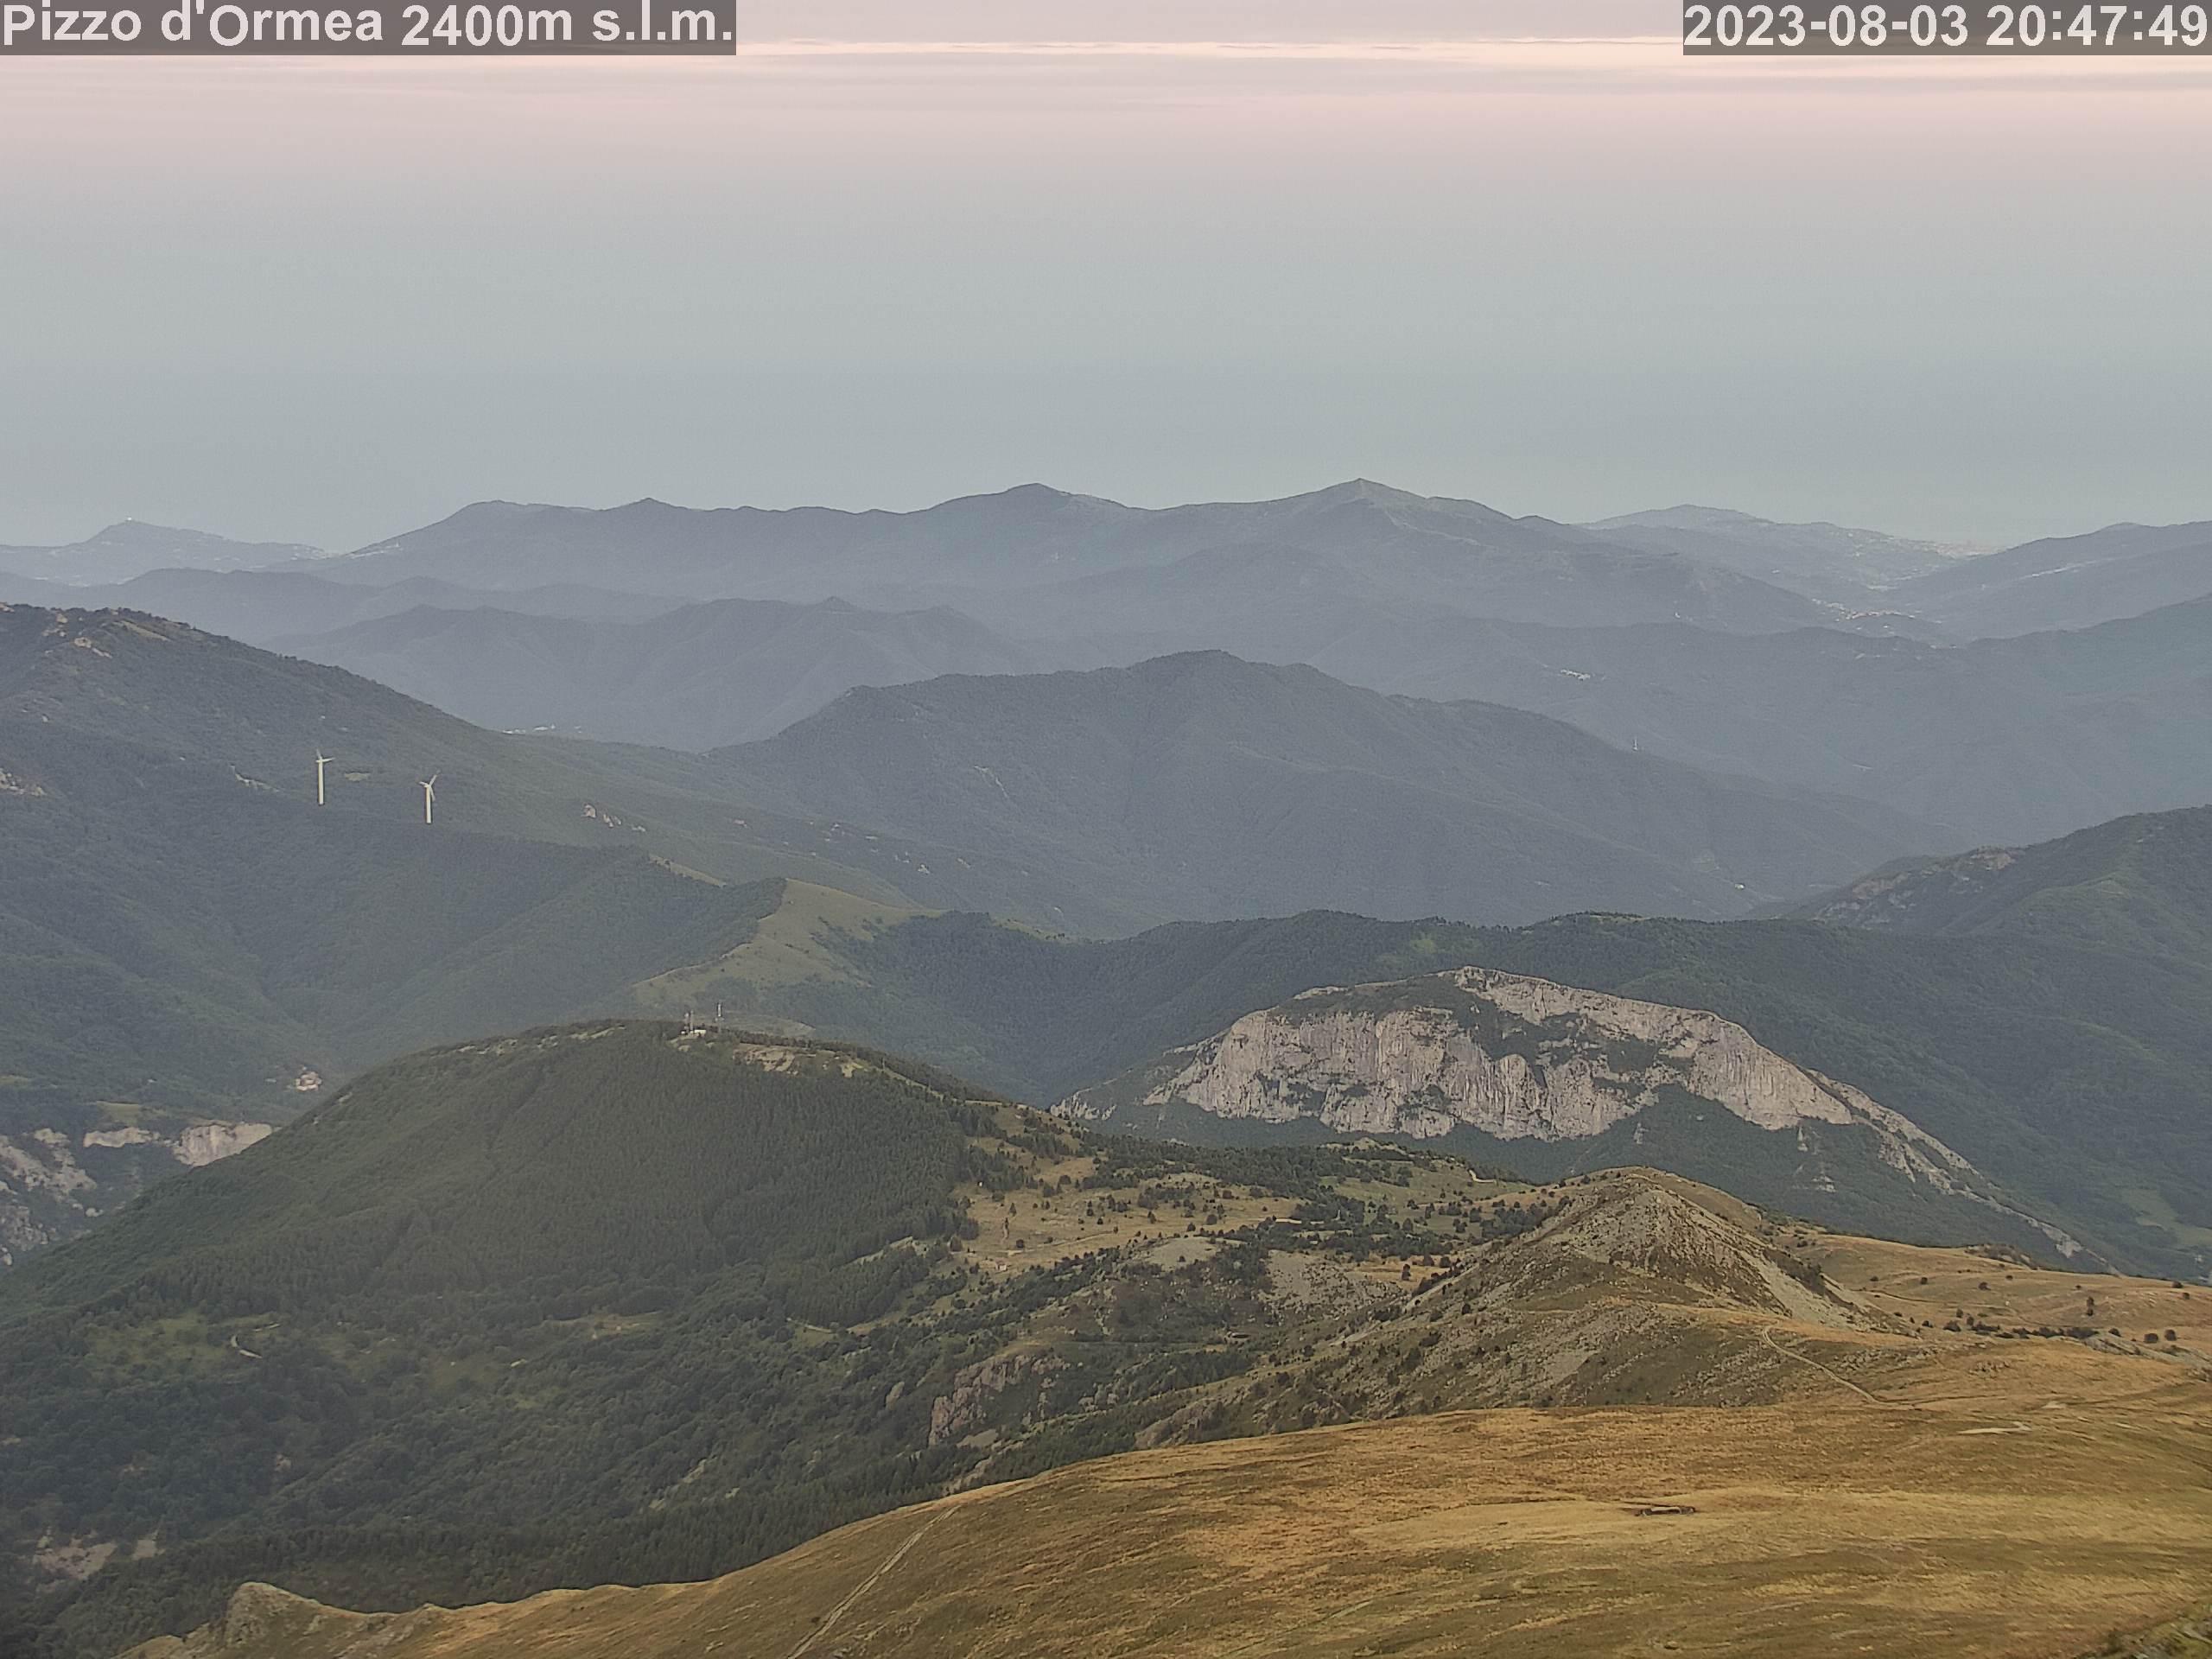 Webcam IR1DD Pizzo di Ormea Alpi Liguri